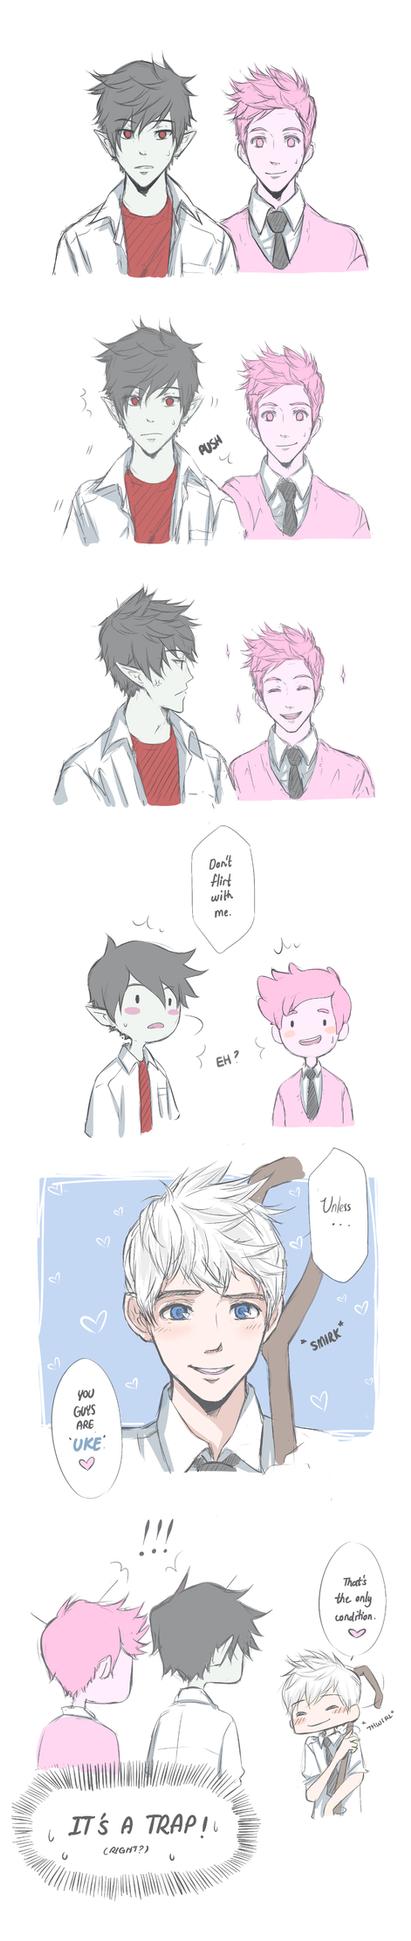 It's a trap ... (Right?) by MiyajimaMizy